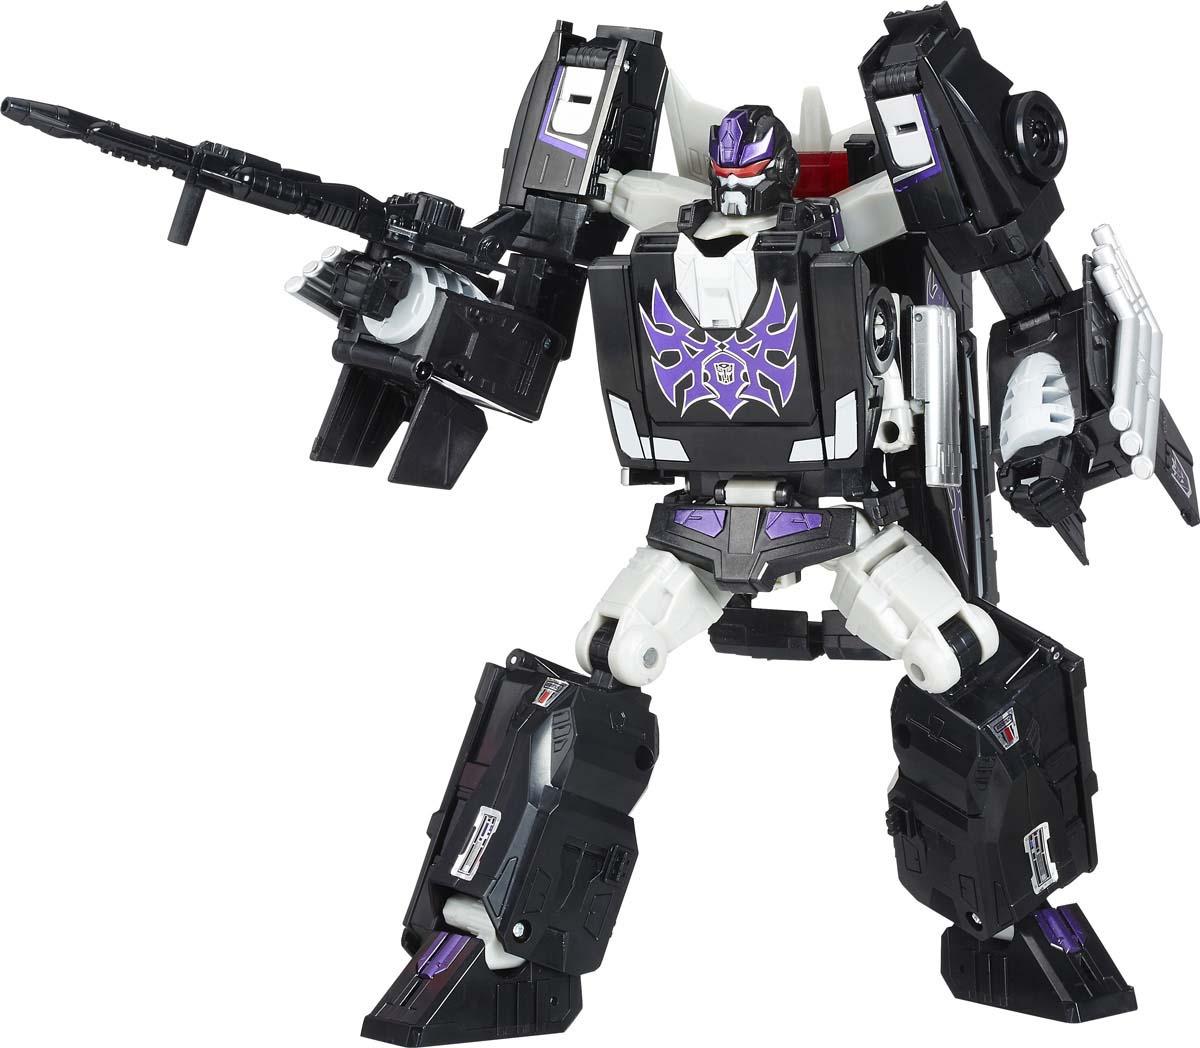 Трансформер Transformers Дженерейшнз Лидер hasbro transformers e0601 дженерейшнз лидер optimus prime